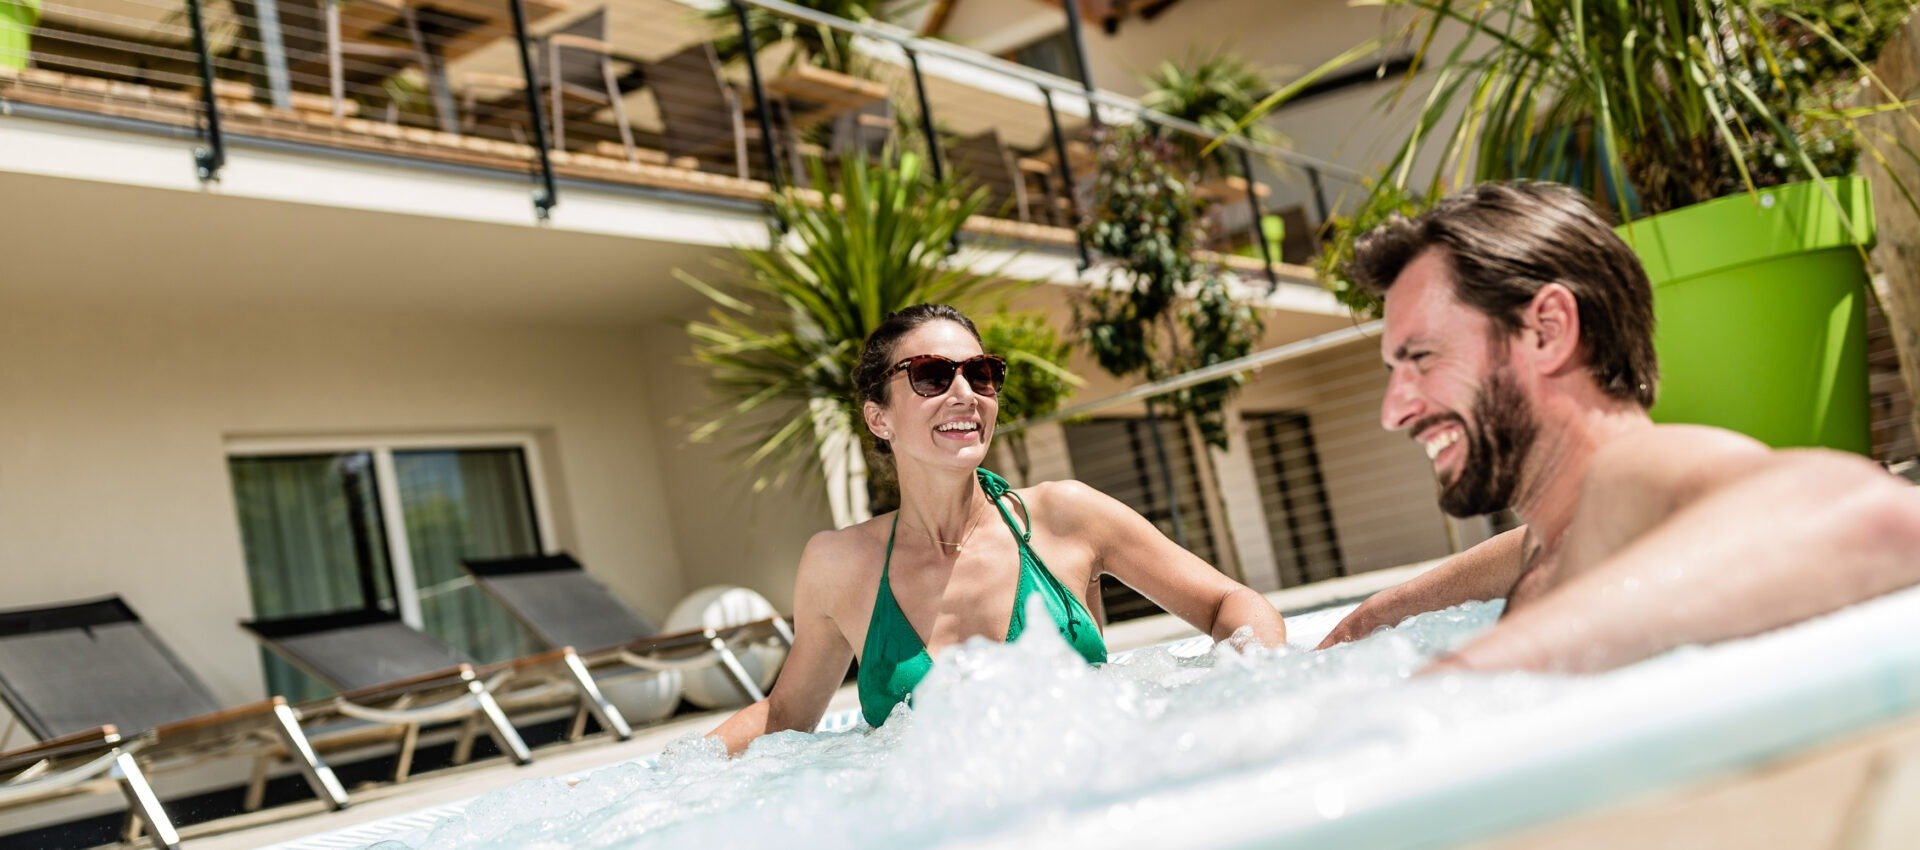 Wihrlpool - Wellness - Genuss - Pfeiss 4 Sterne Hotel Lana - Meran Südtirol